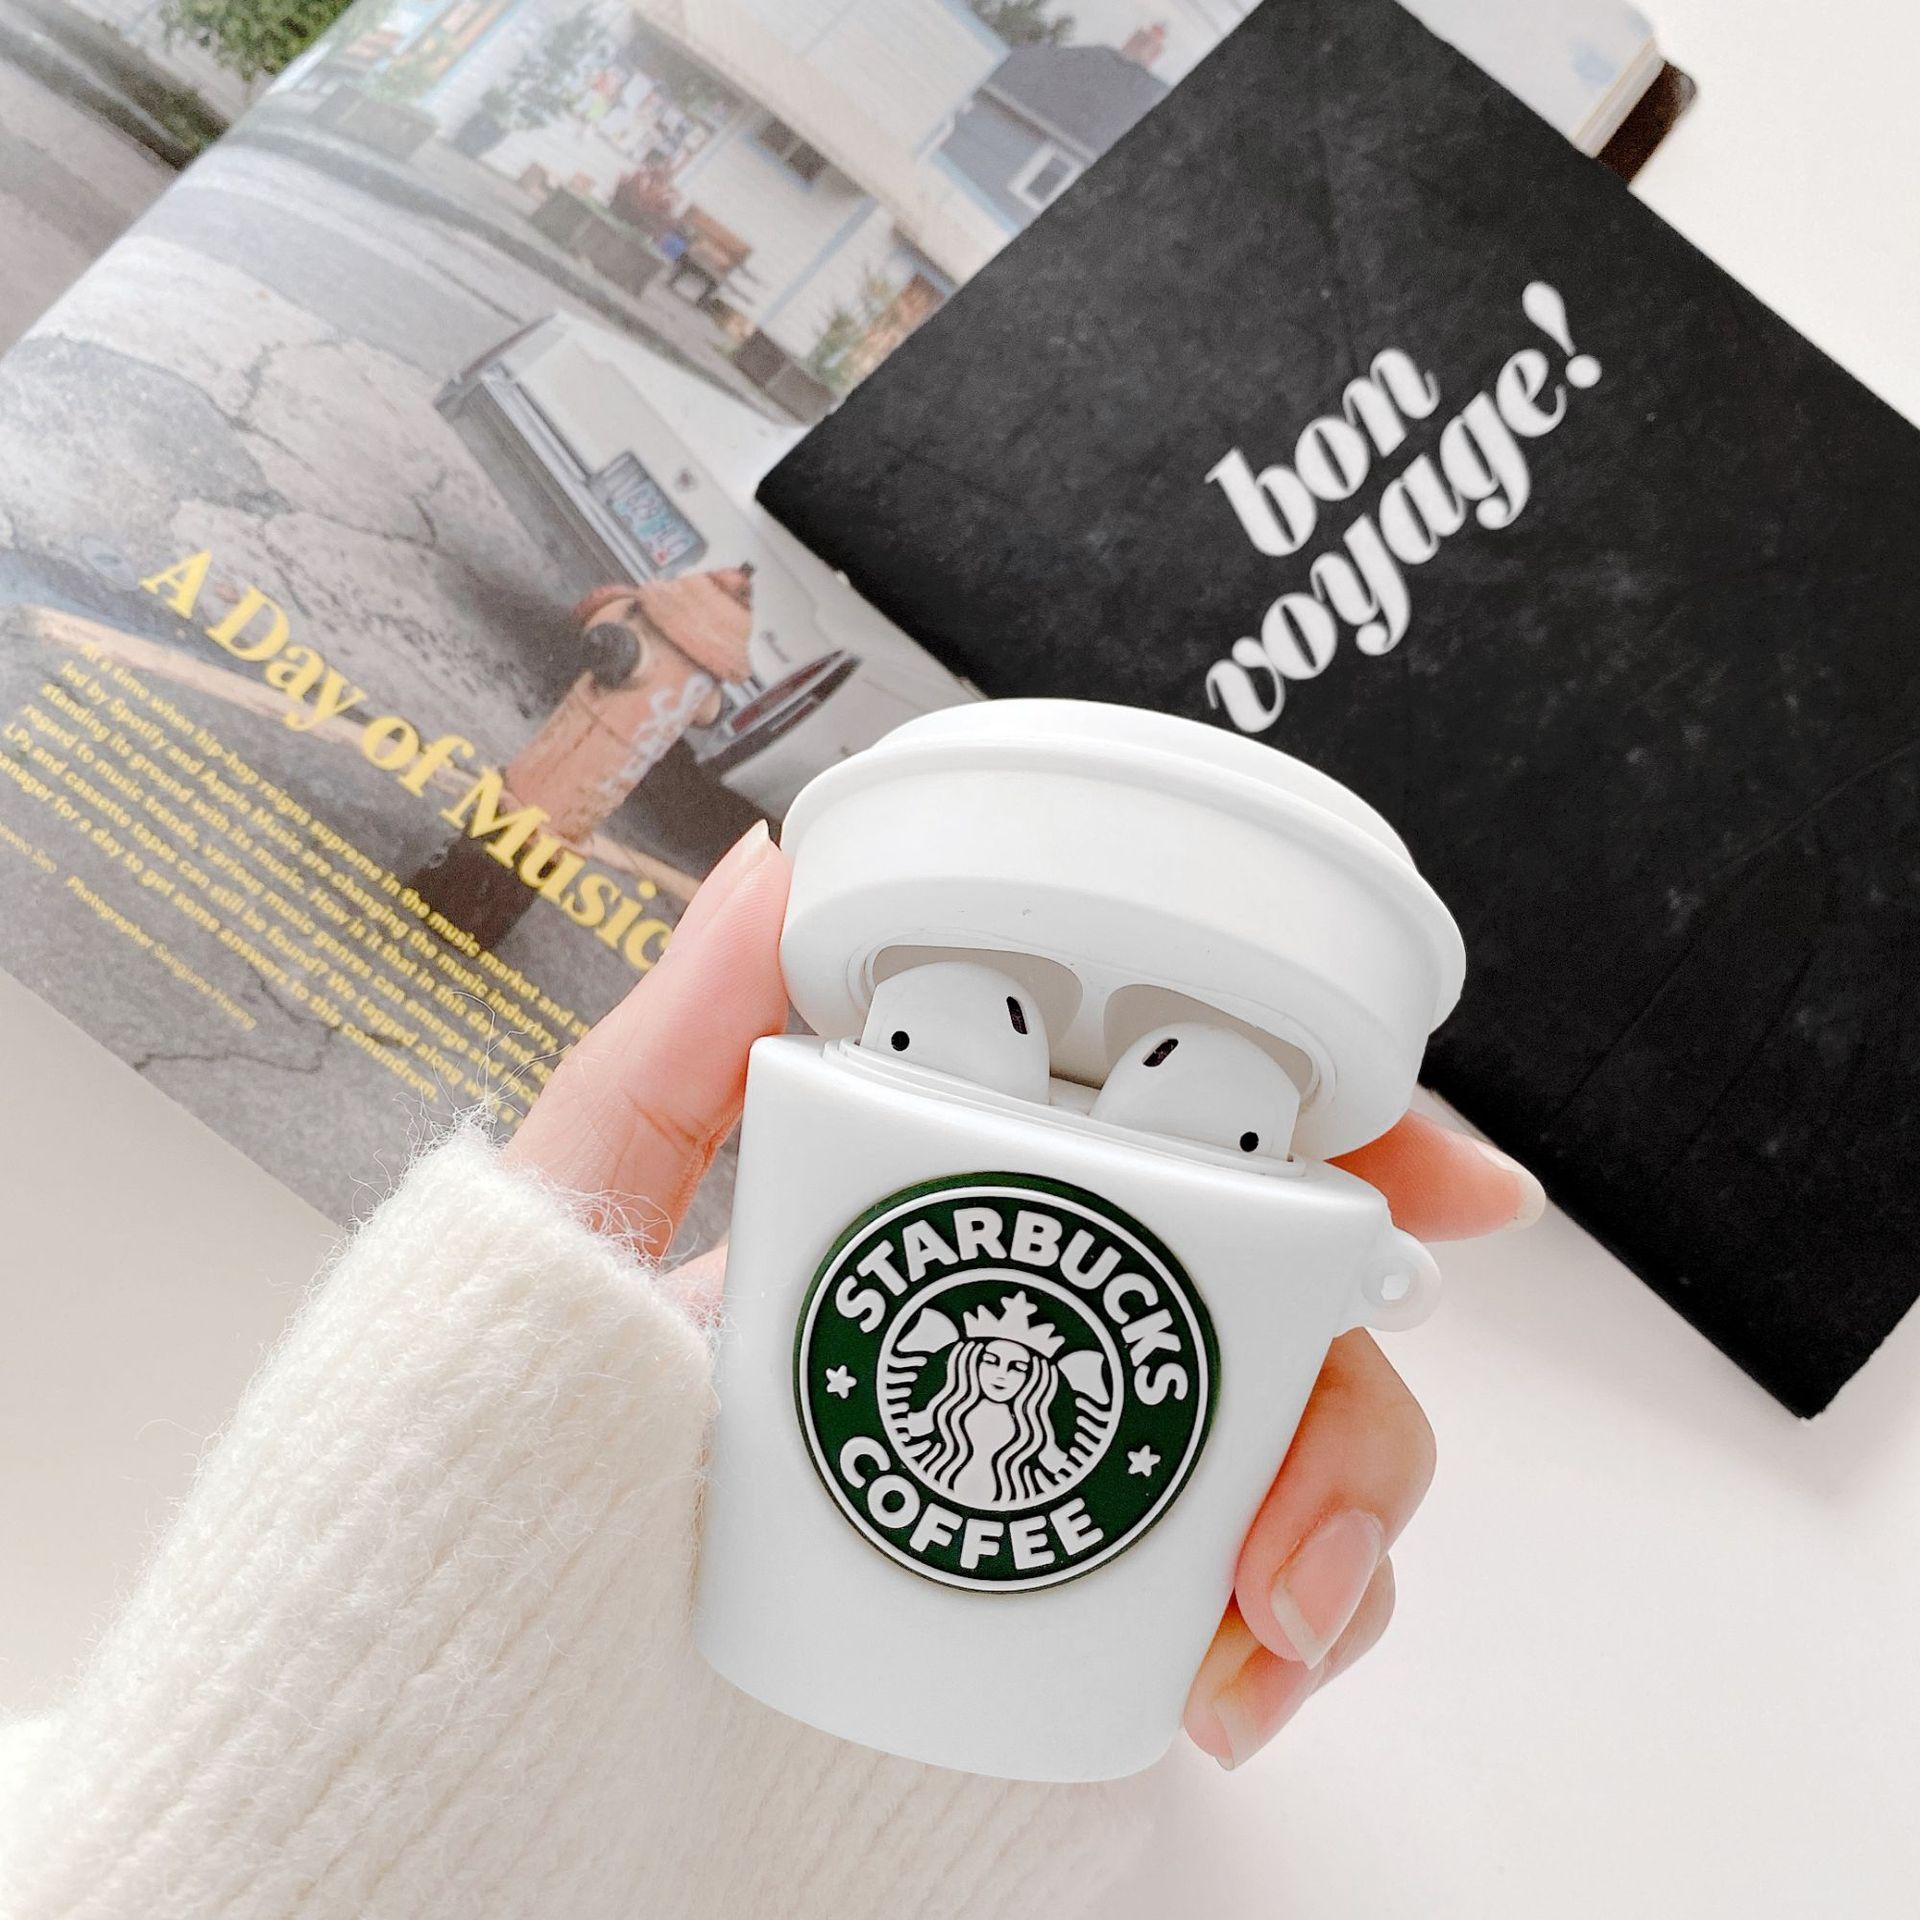 Case Airpods - Ốp Airpods 1/2/3 ( Pro ) - Cốc Starbucks